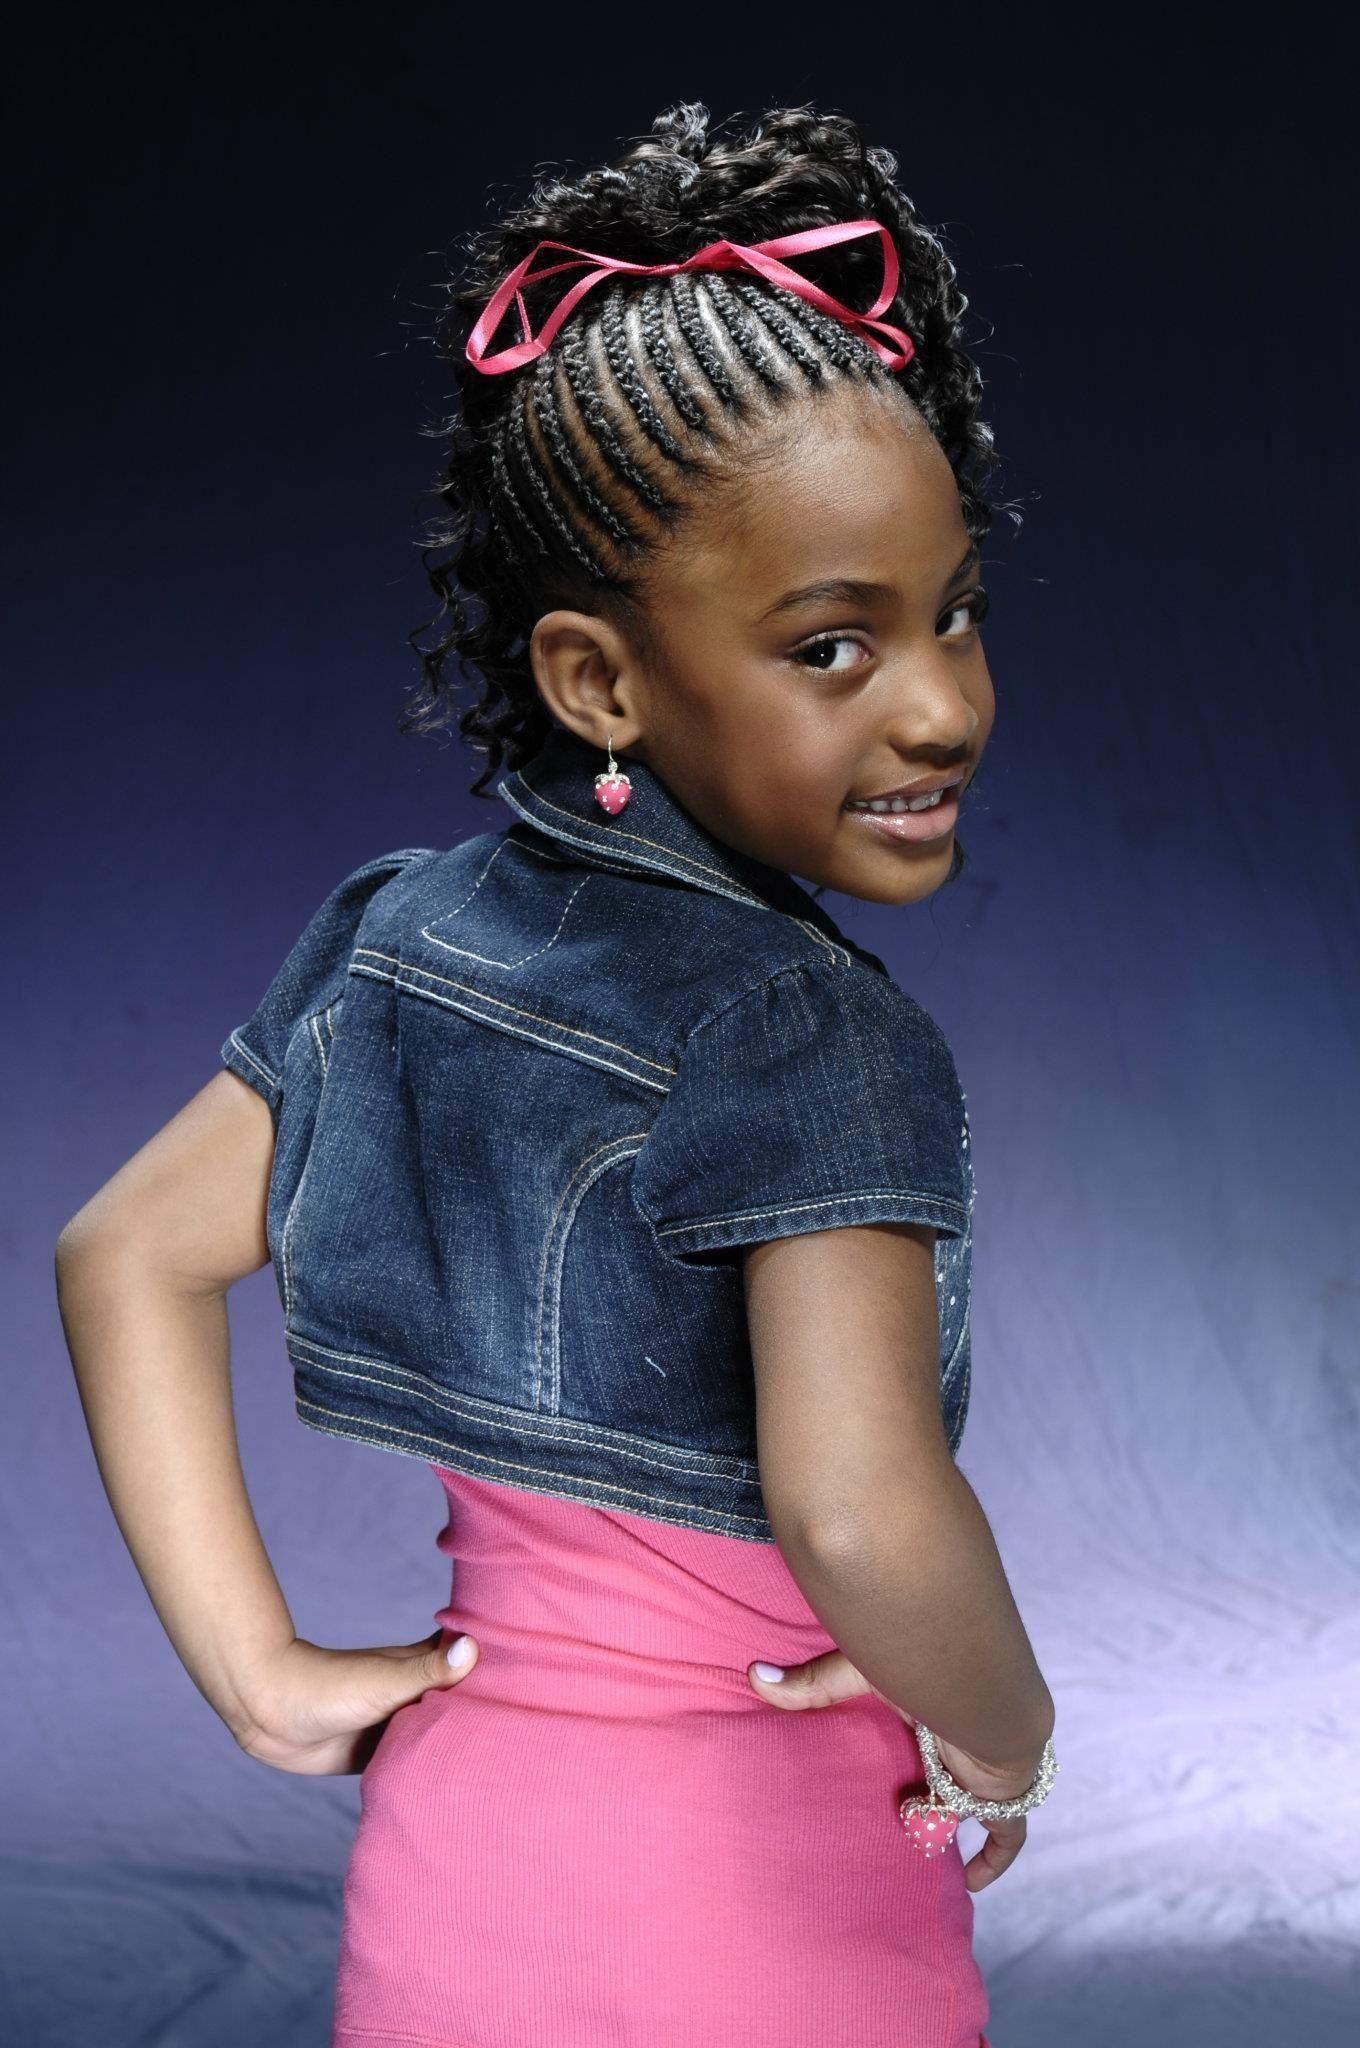 23+ Black kids hair salon ideas